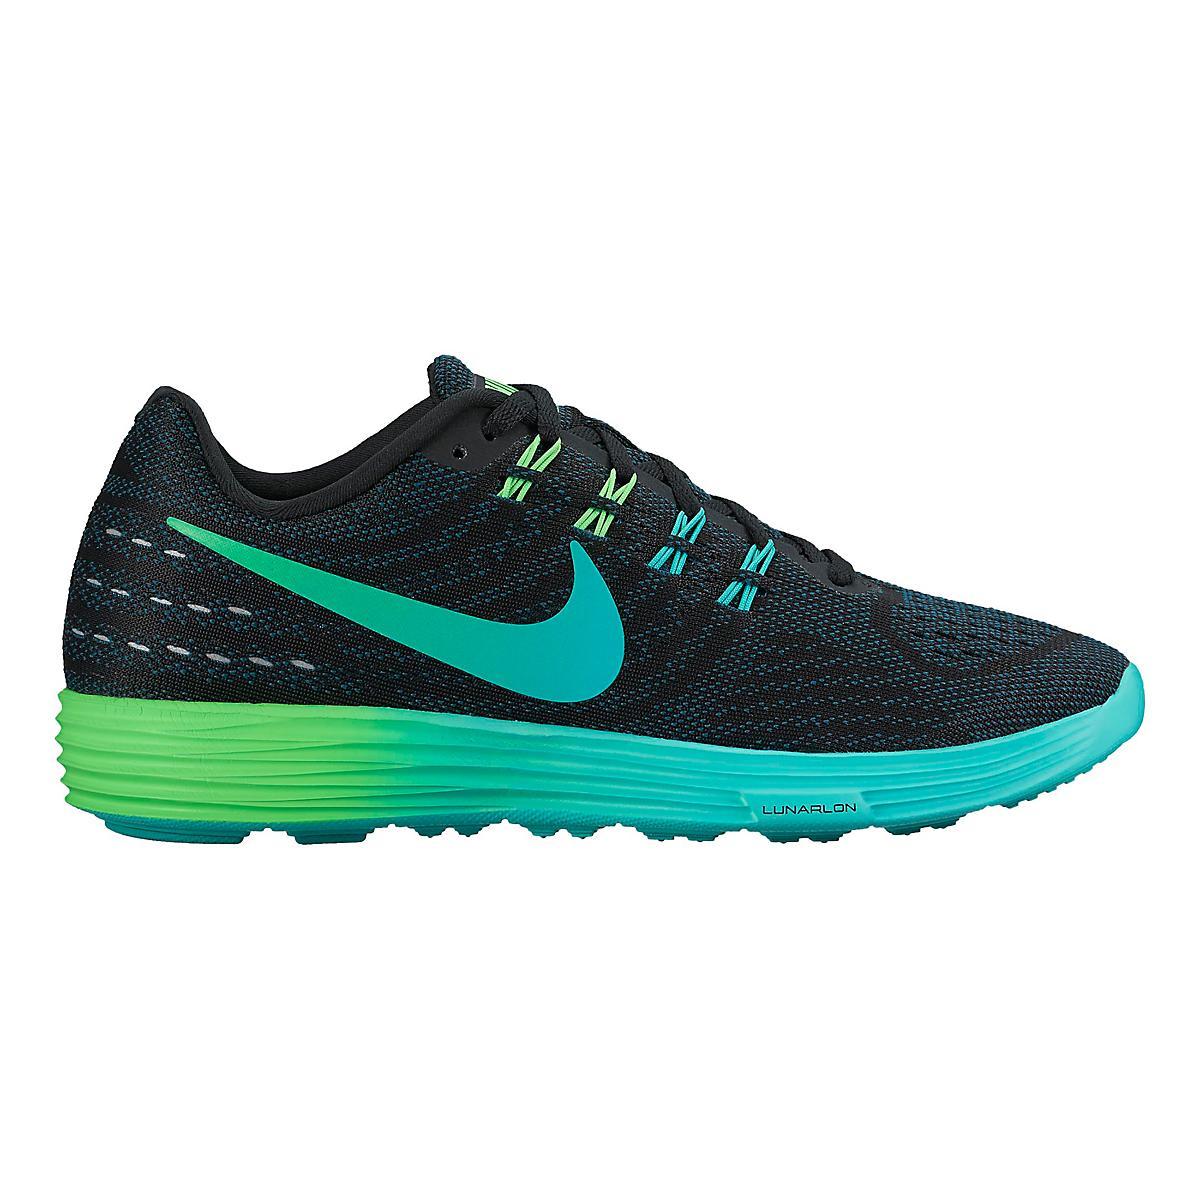 Womens Nike LunarTempo 2 Running Shoe at Road Runner Sports